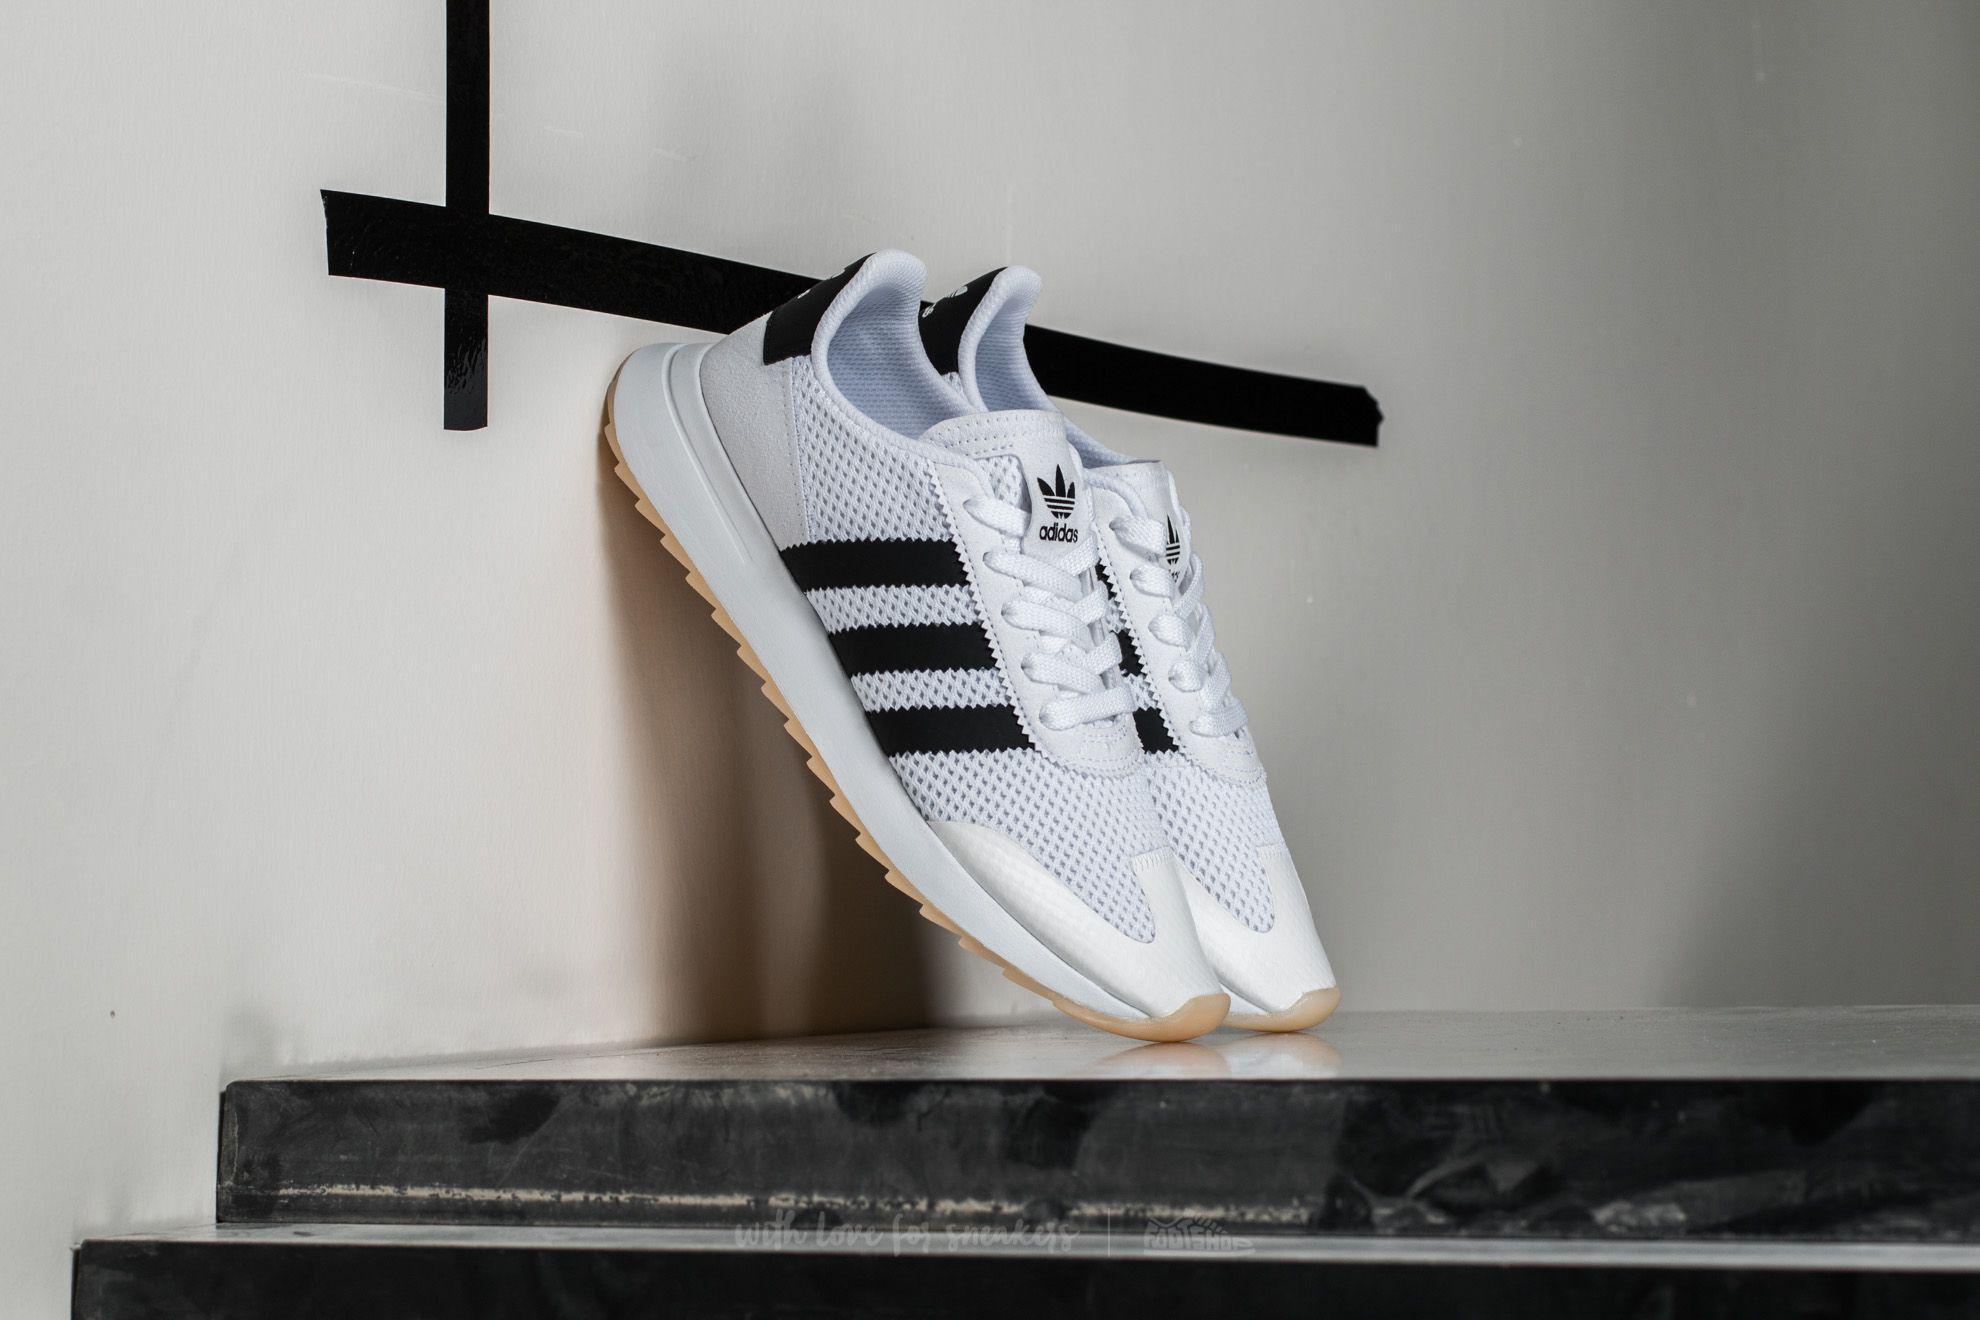 lyst adidas originali adidas flashback w ftw bianco / nucleo nero